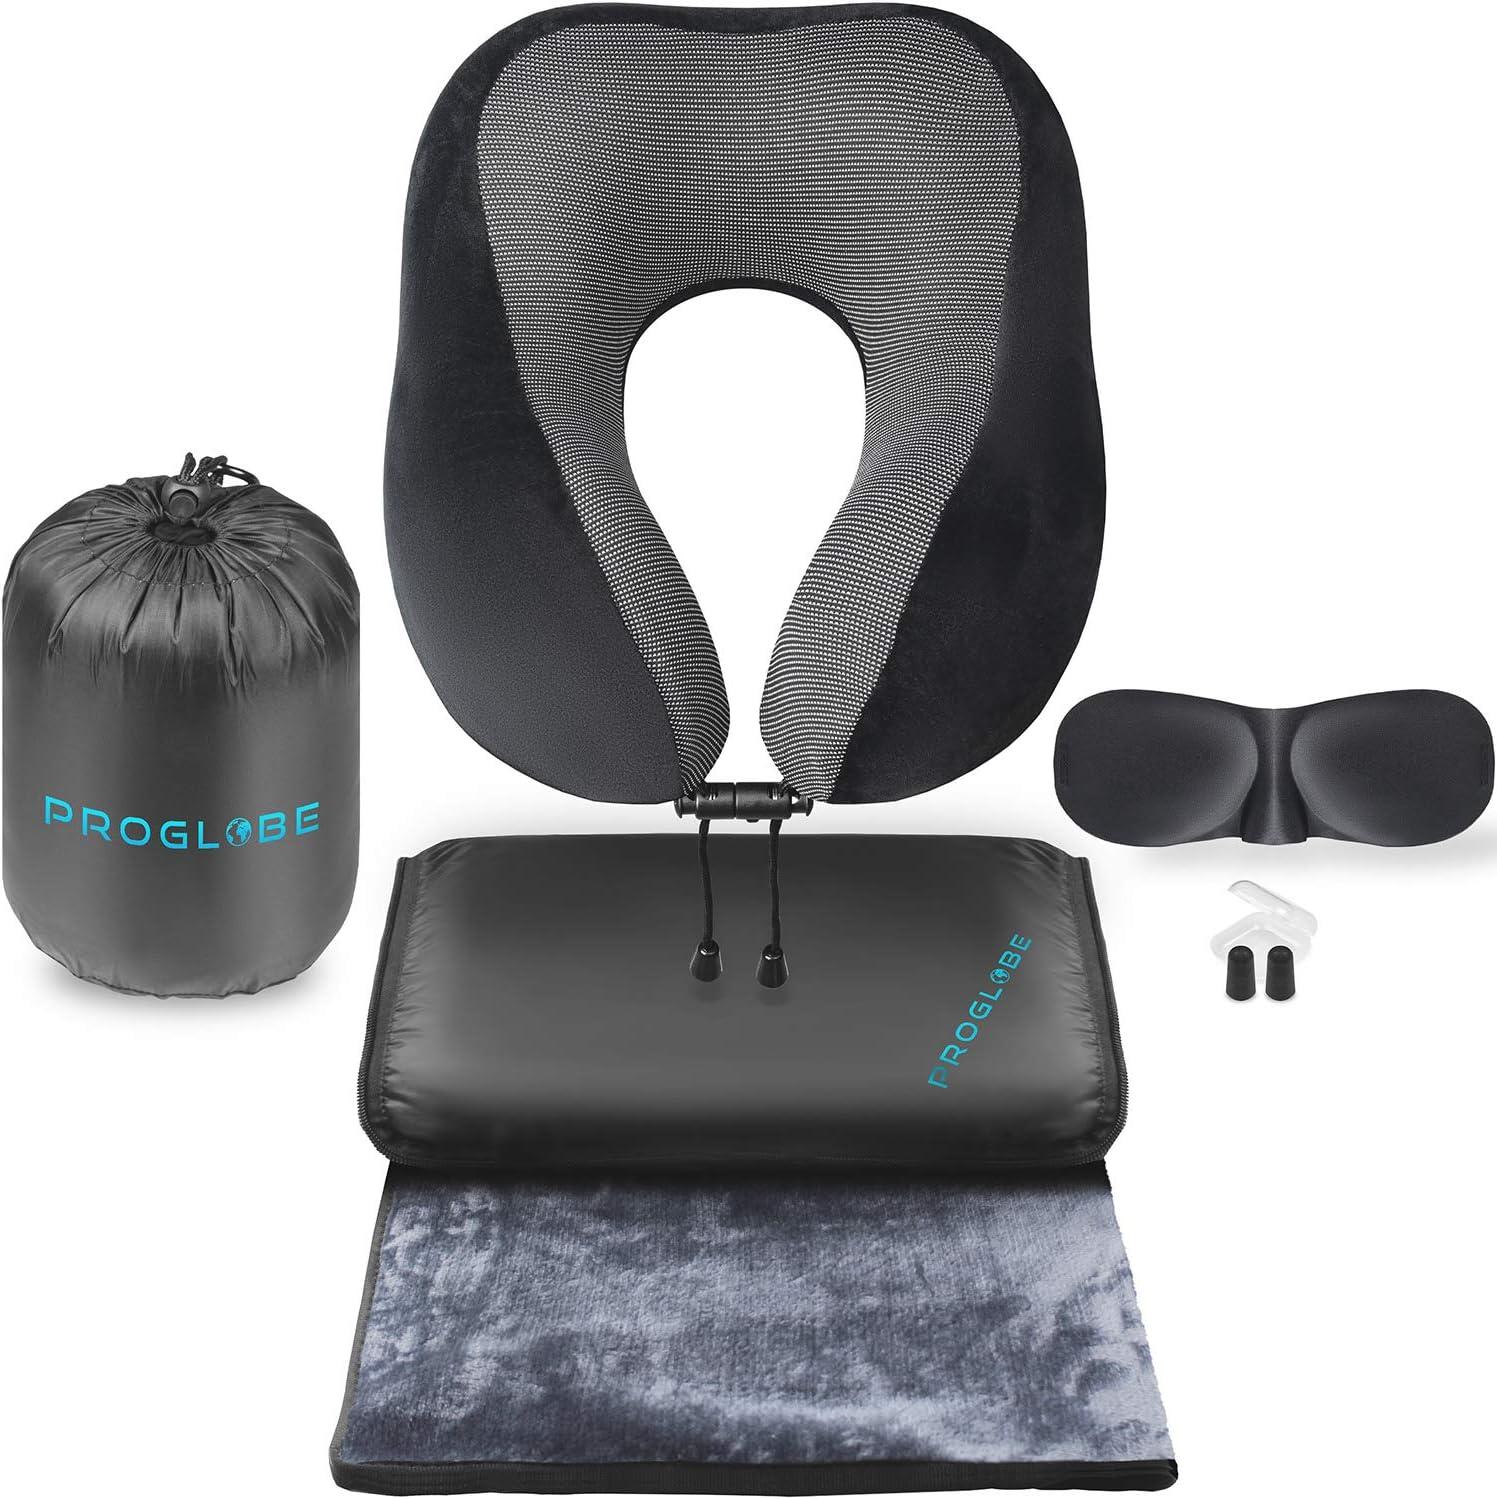 Proglobe Travel Blanket Luxury Travel Set - Ergonomic Airplane Neck Pillow 100% Pure Memory Foam and Super Soft Fleece Blanket - Premium 3D Sleep Mask & Earplugs - Ultimate 4-in-1 Travel Kit Black